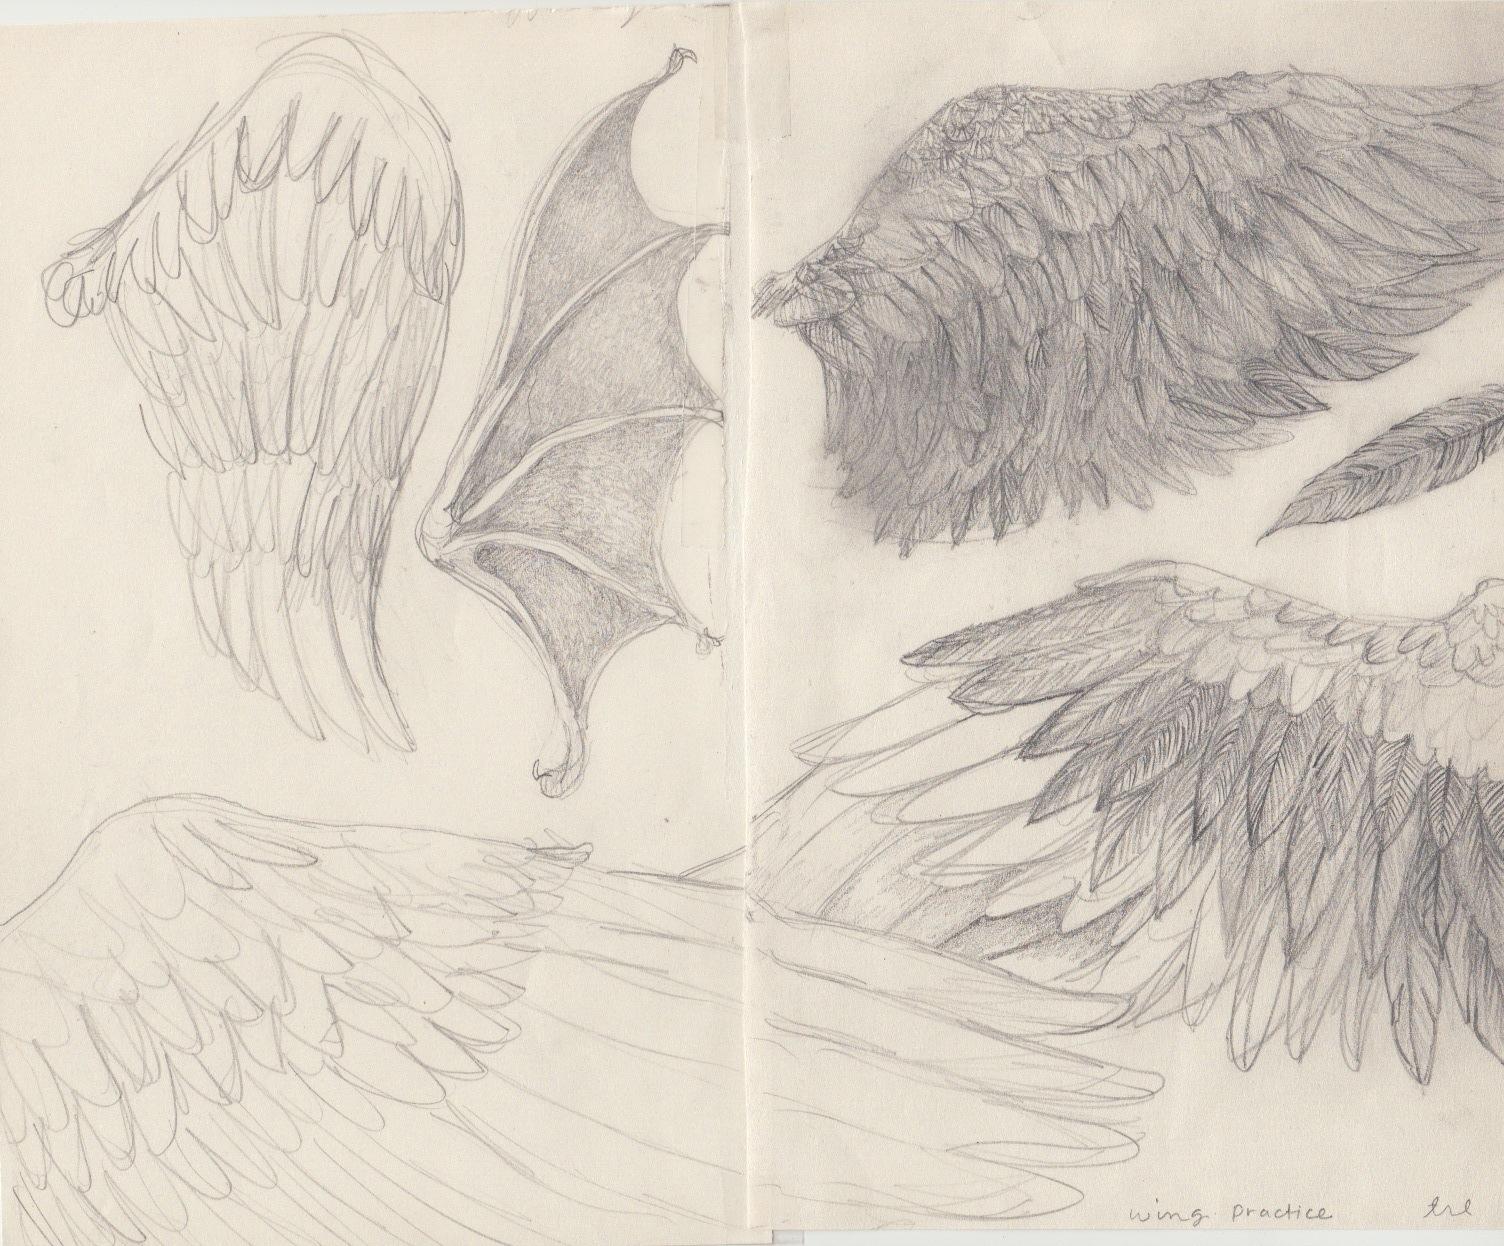 wing-practice-2.jpeg